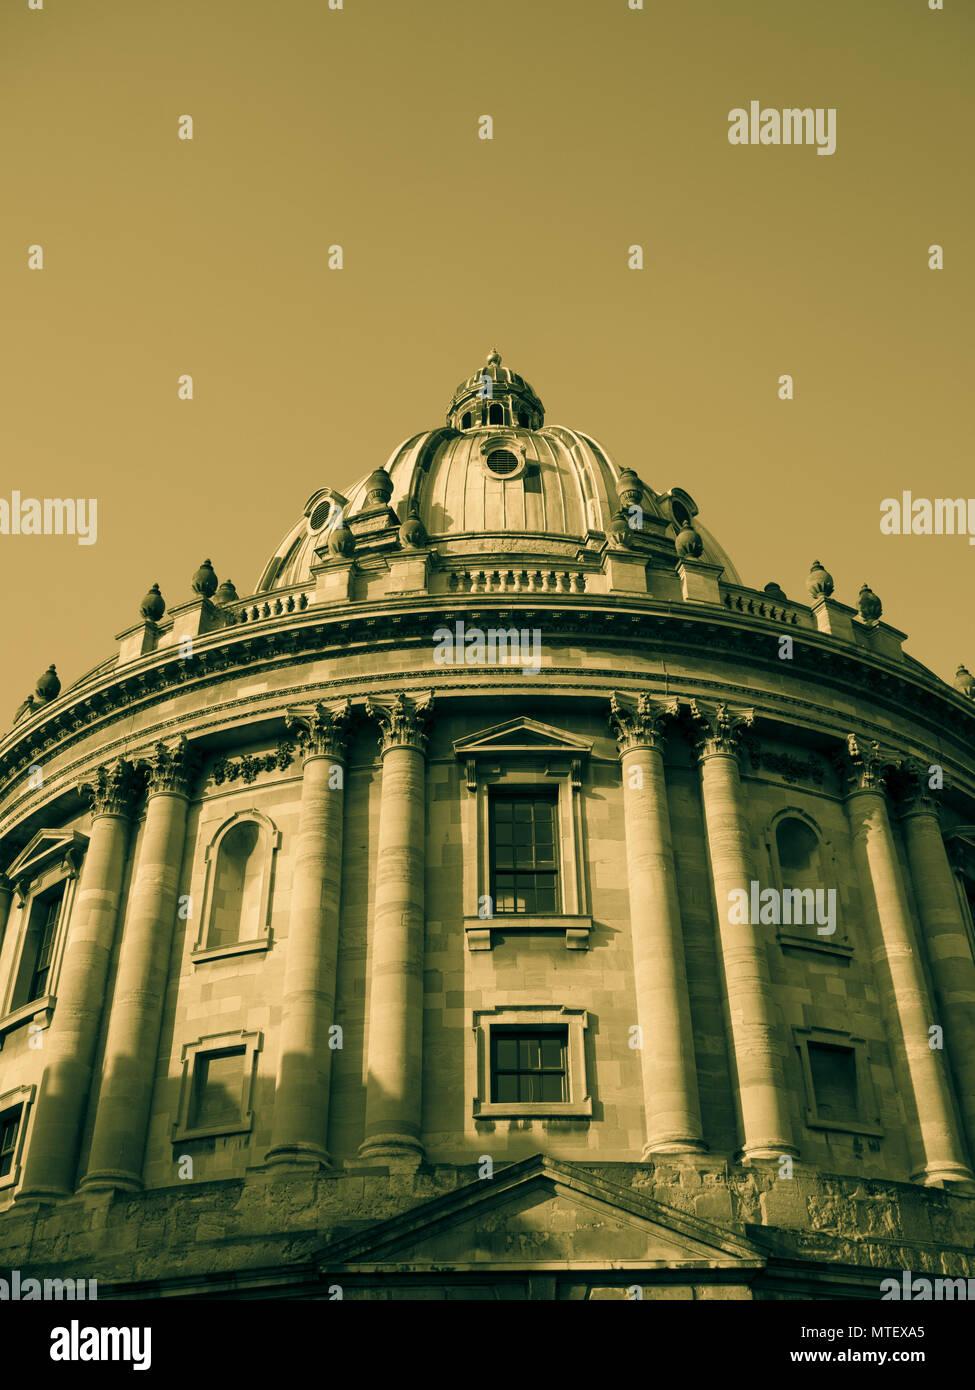 Oxford Wahrzeichen, Radcliffe Camera, Oxford University, Radcliffe Square, Oxford, Oxfordshire, England, UK, GB. Stockbild